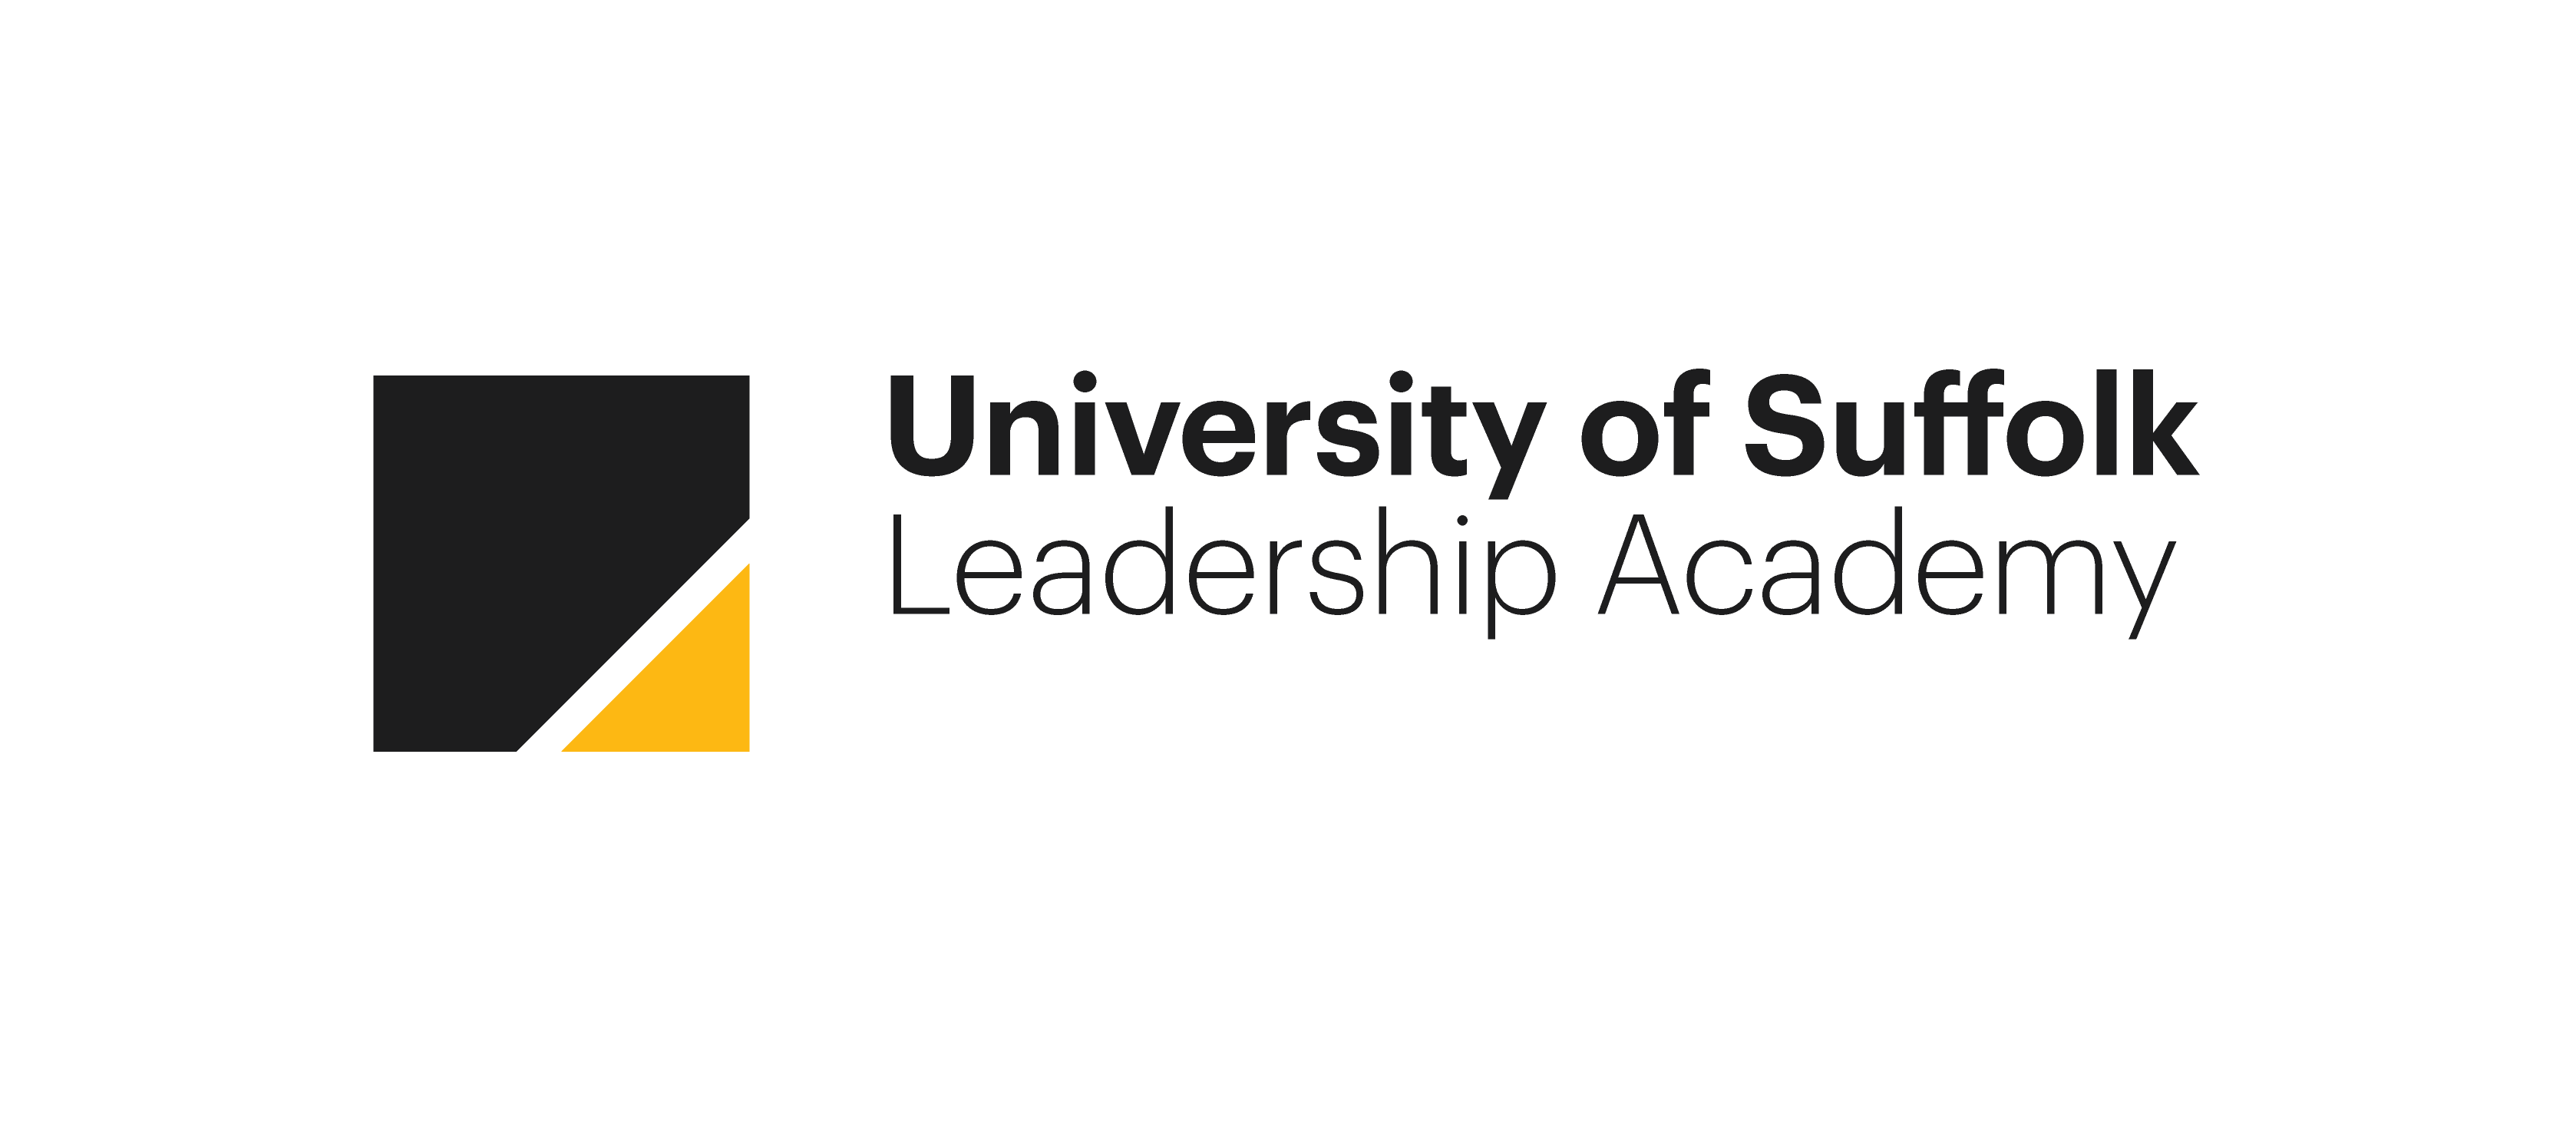 Leadership Academy Sub-brand logo